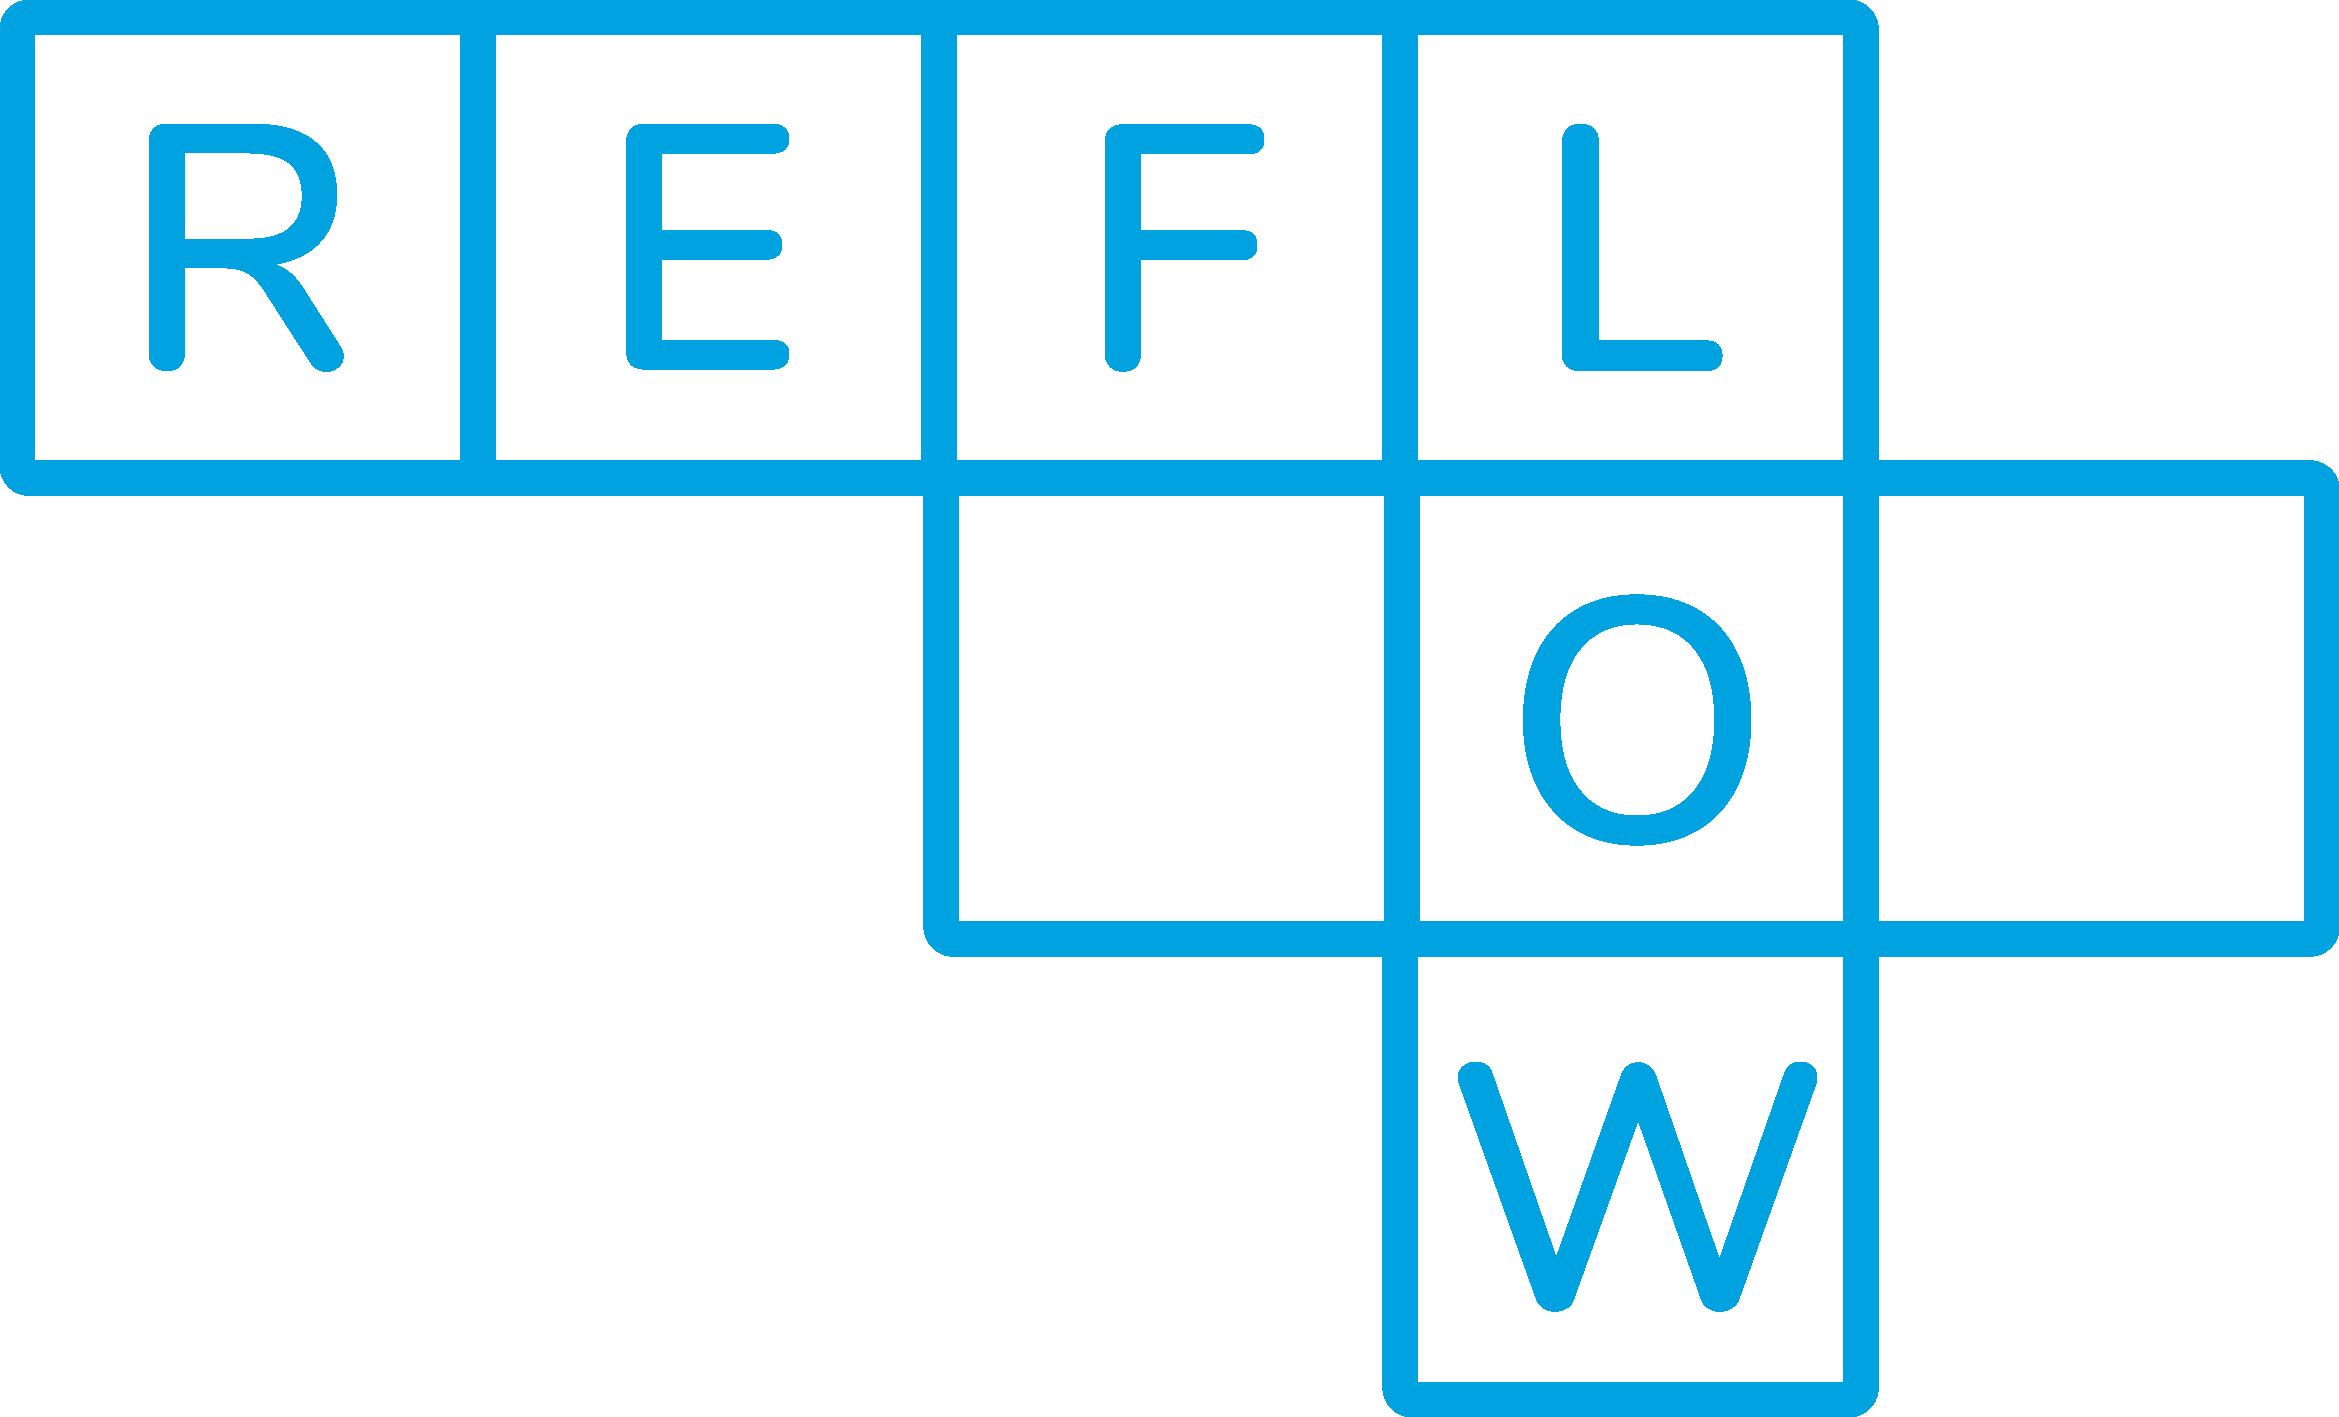 reflow_logo_blue - Jasper Middendorp.png